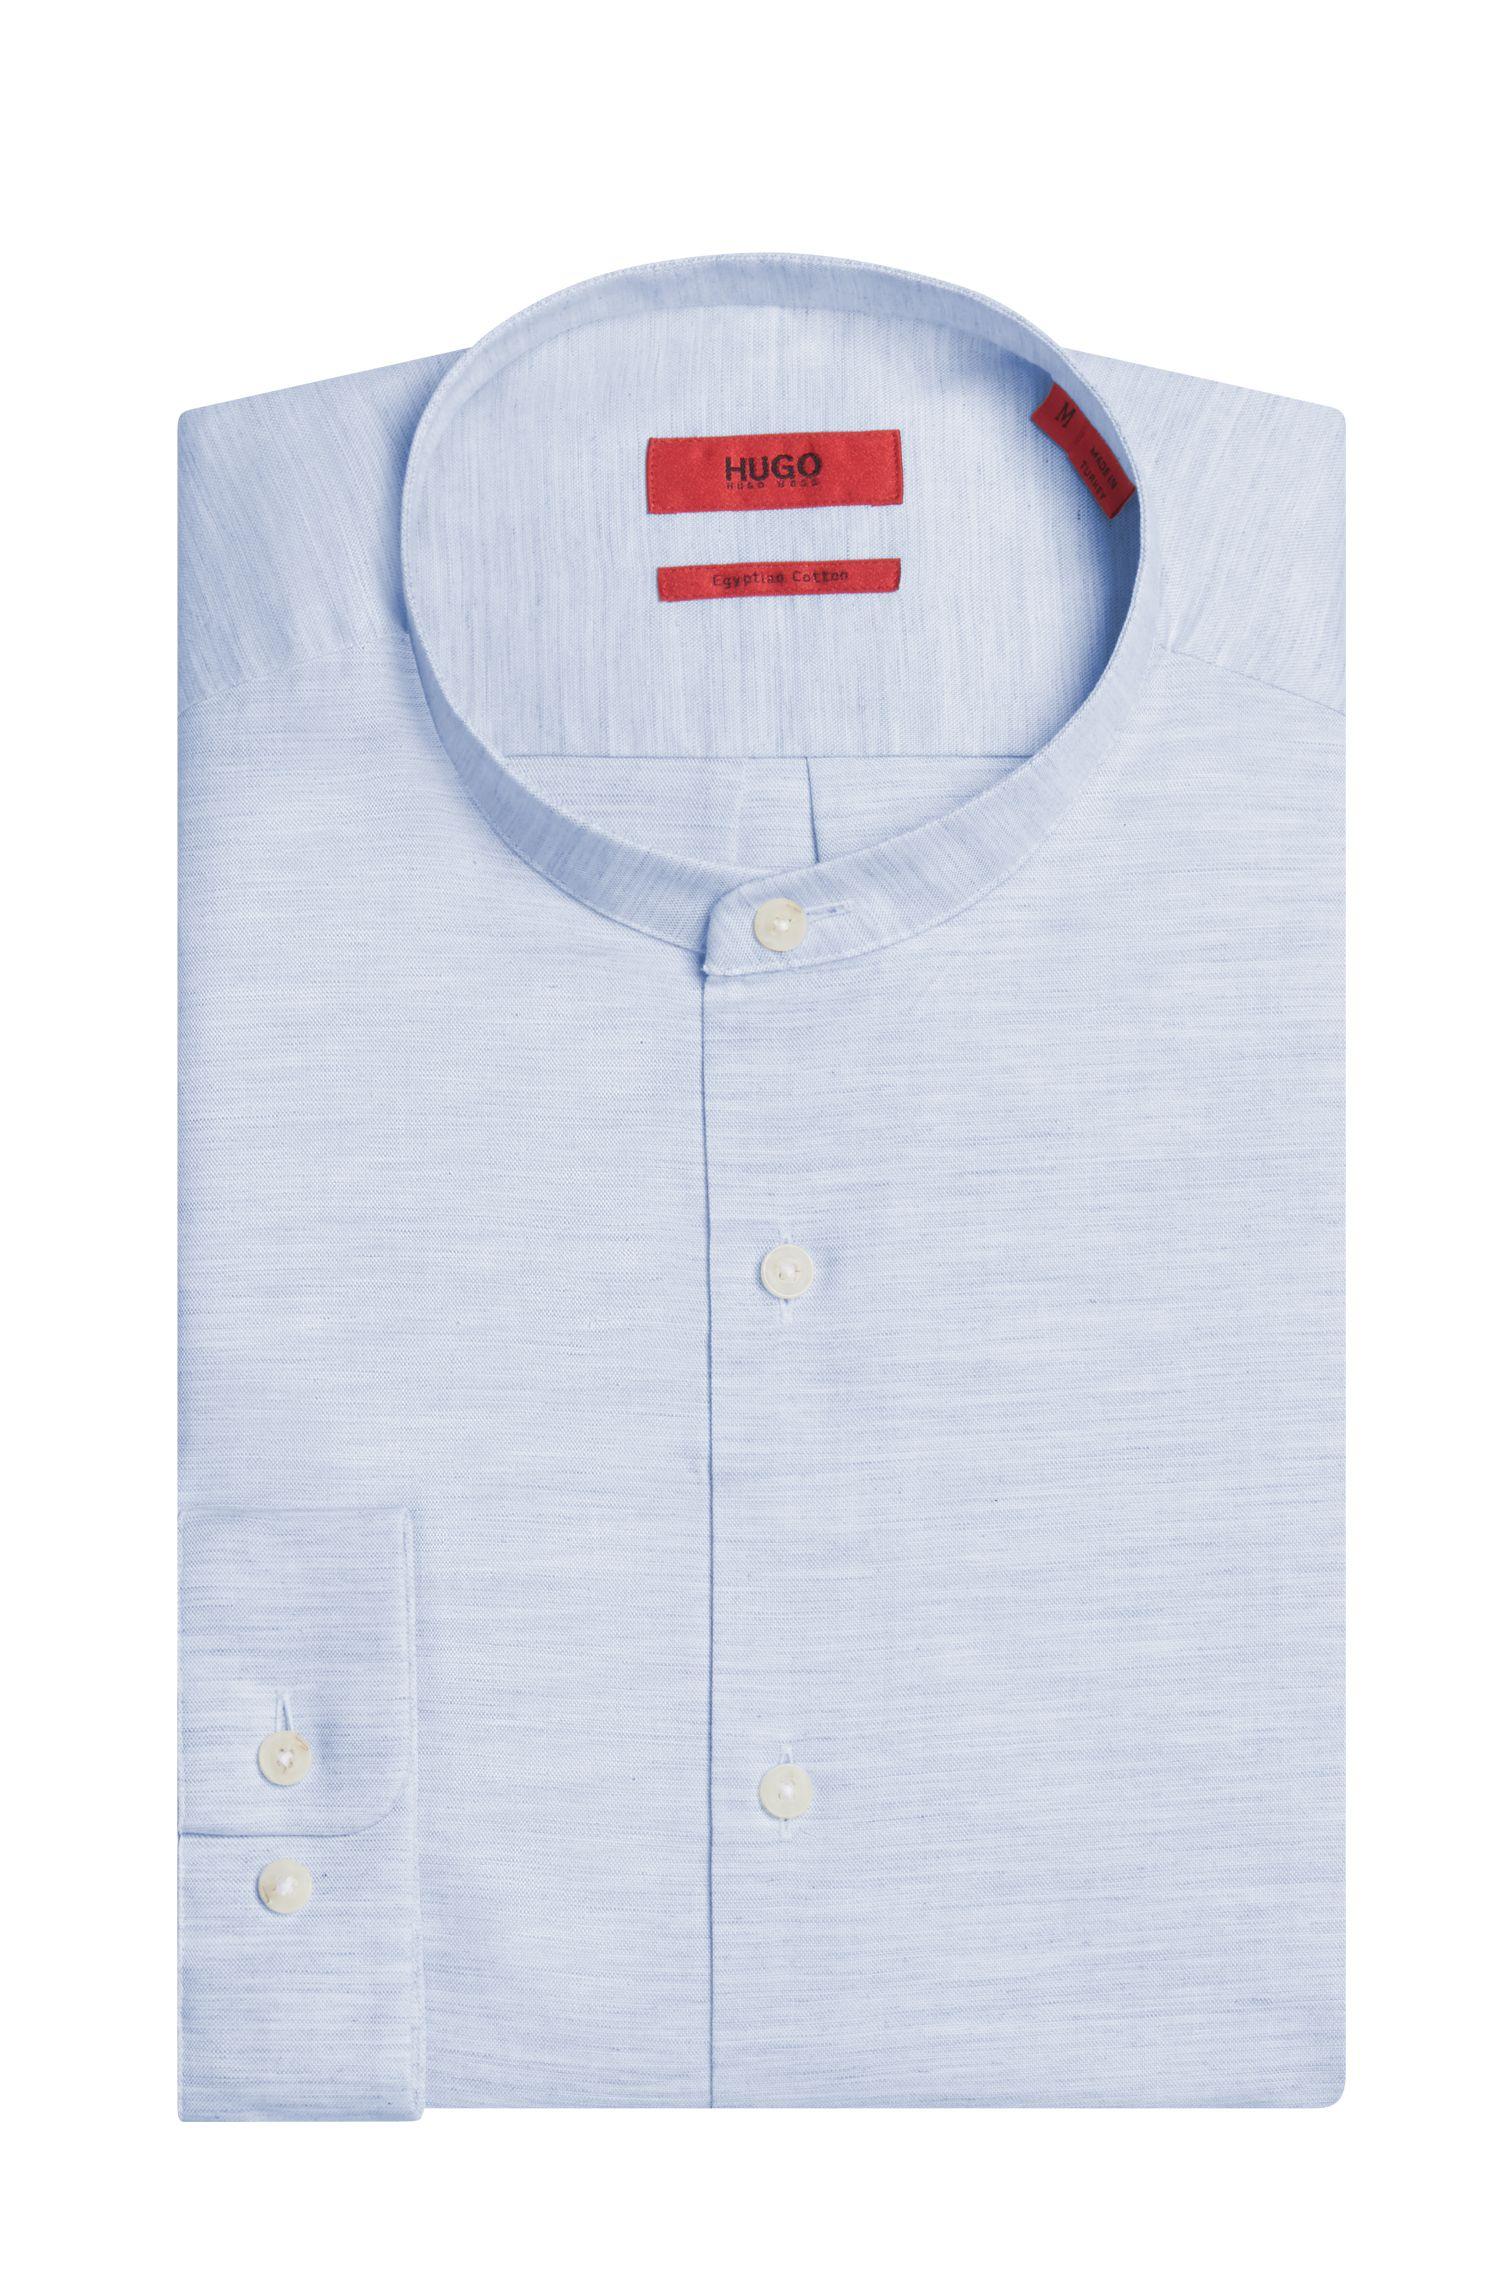 Cotton Sport Shirt, Regular Fit | Eddison W